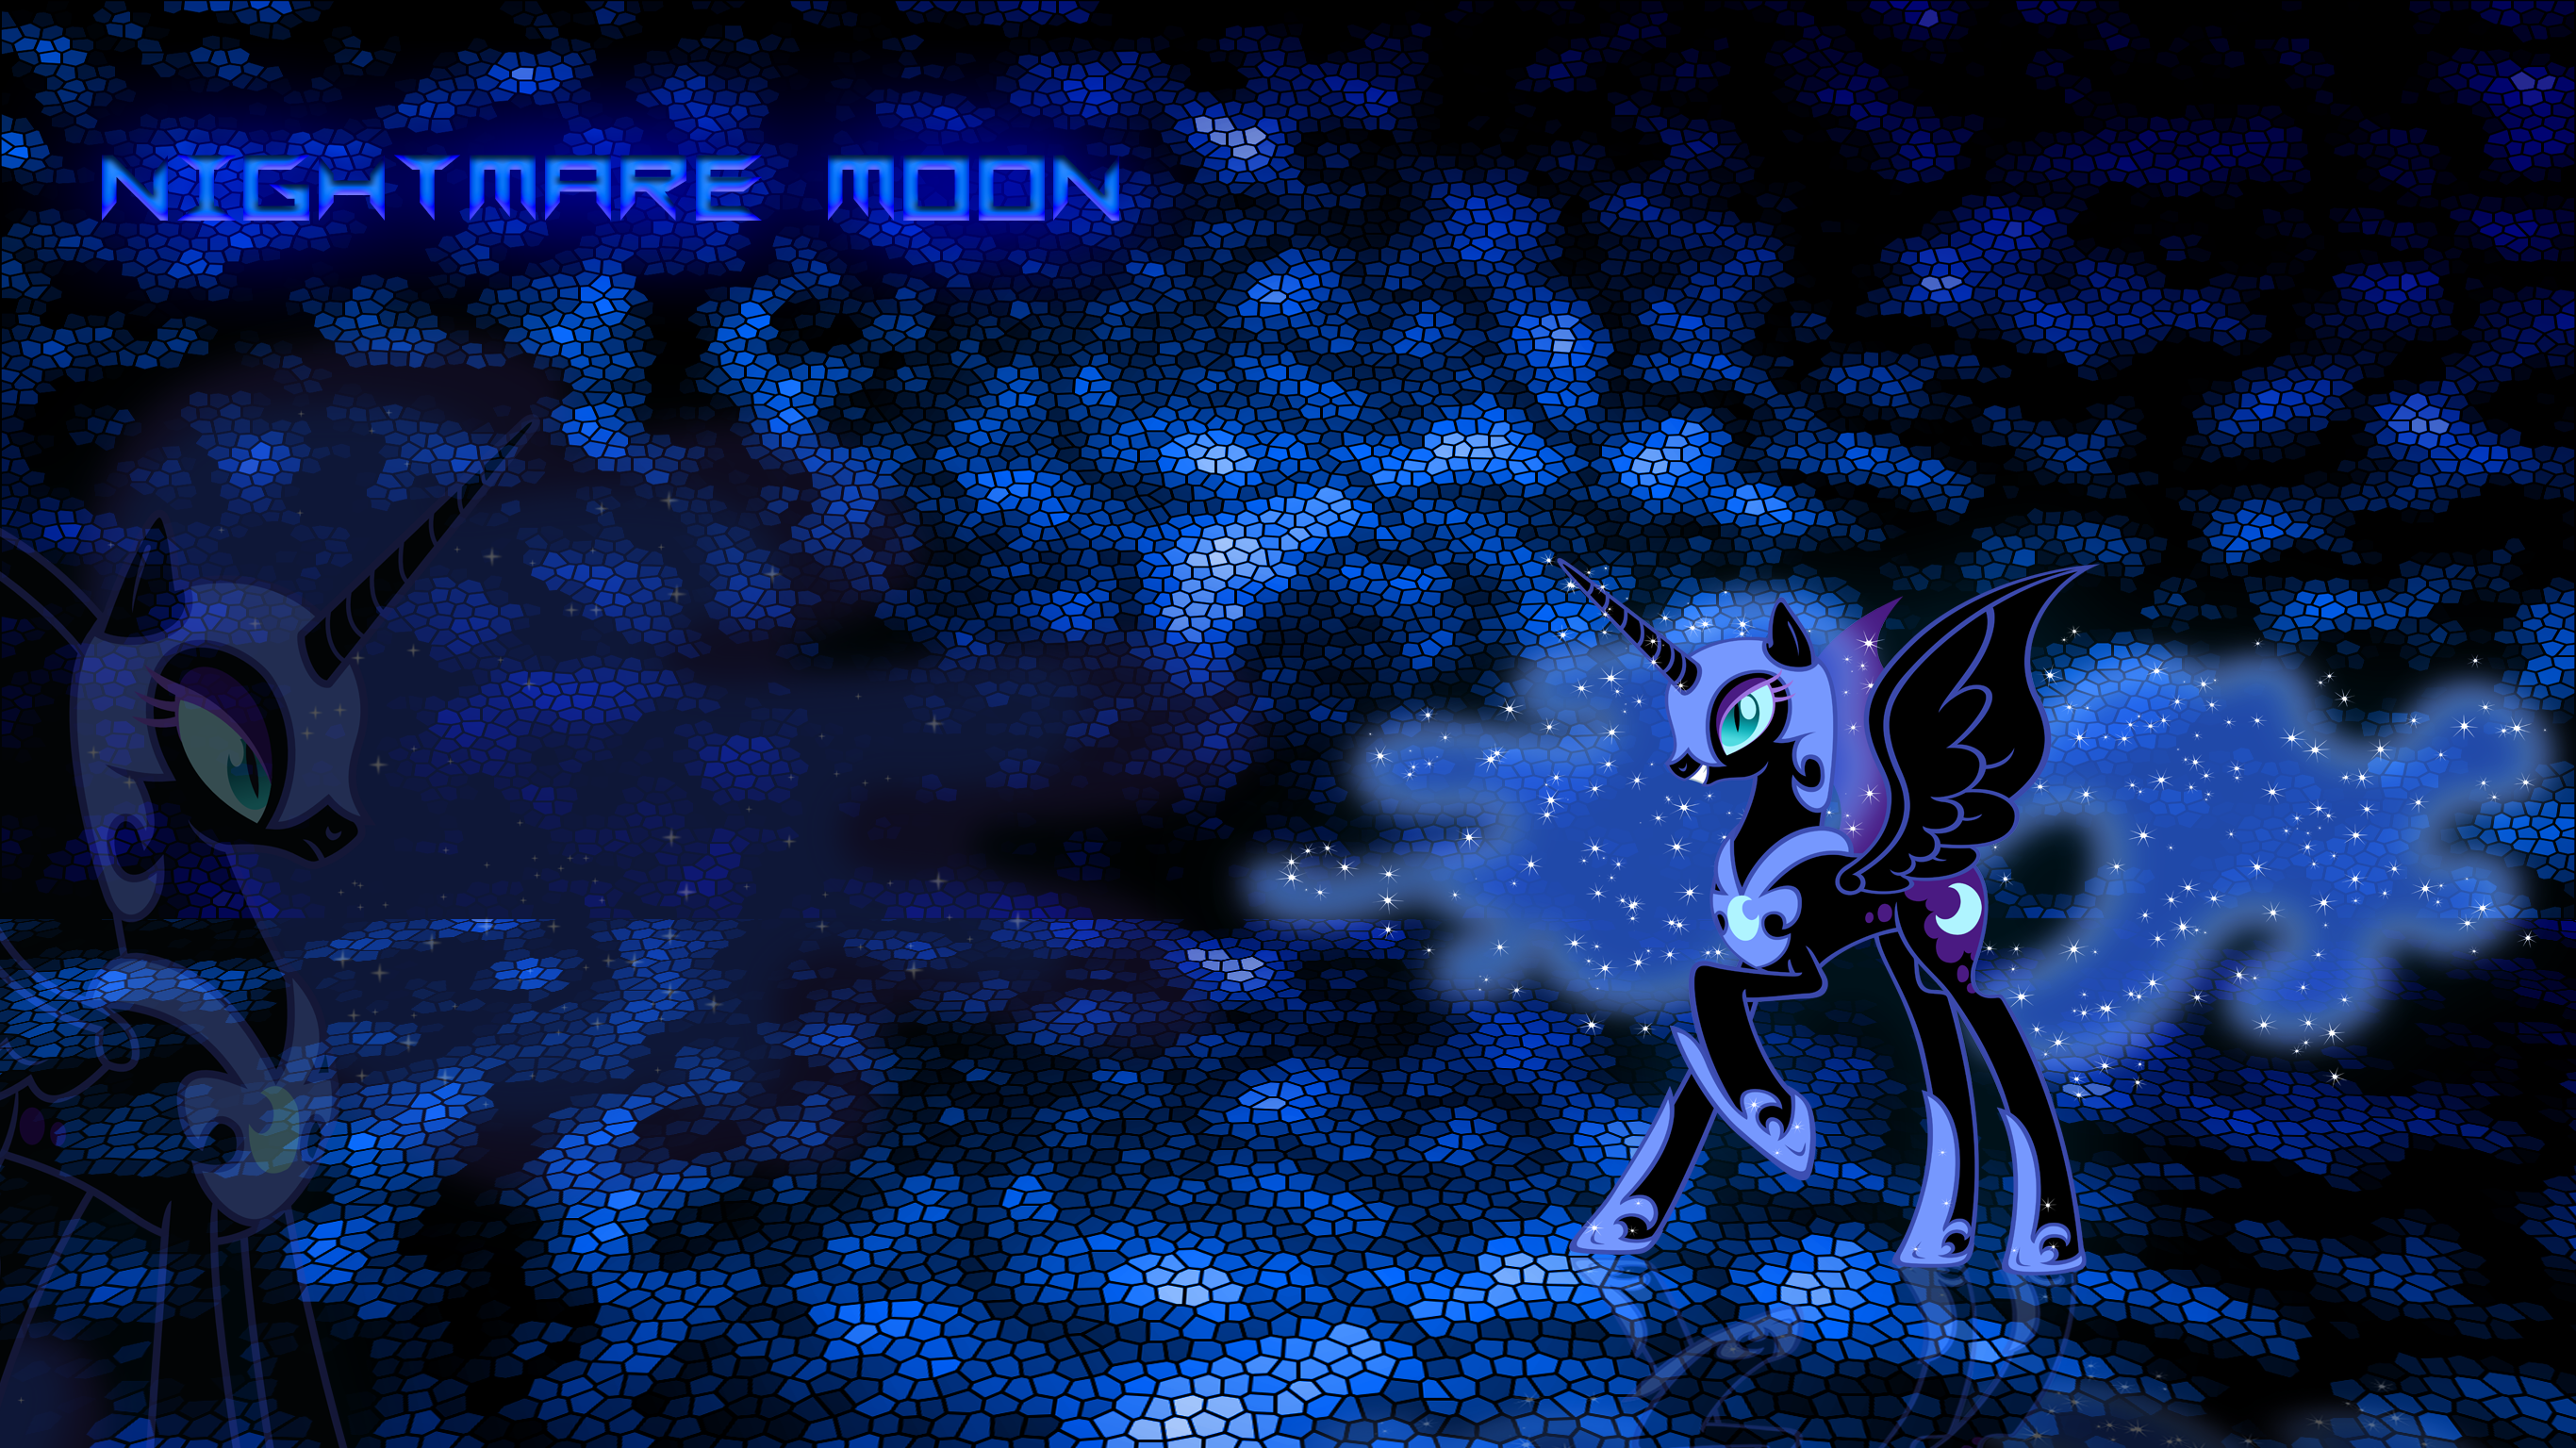 Nightmare Moon wallpaper by JamesG2498 2732x1536